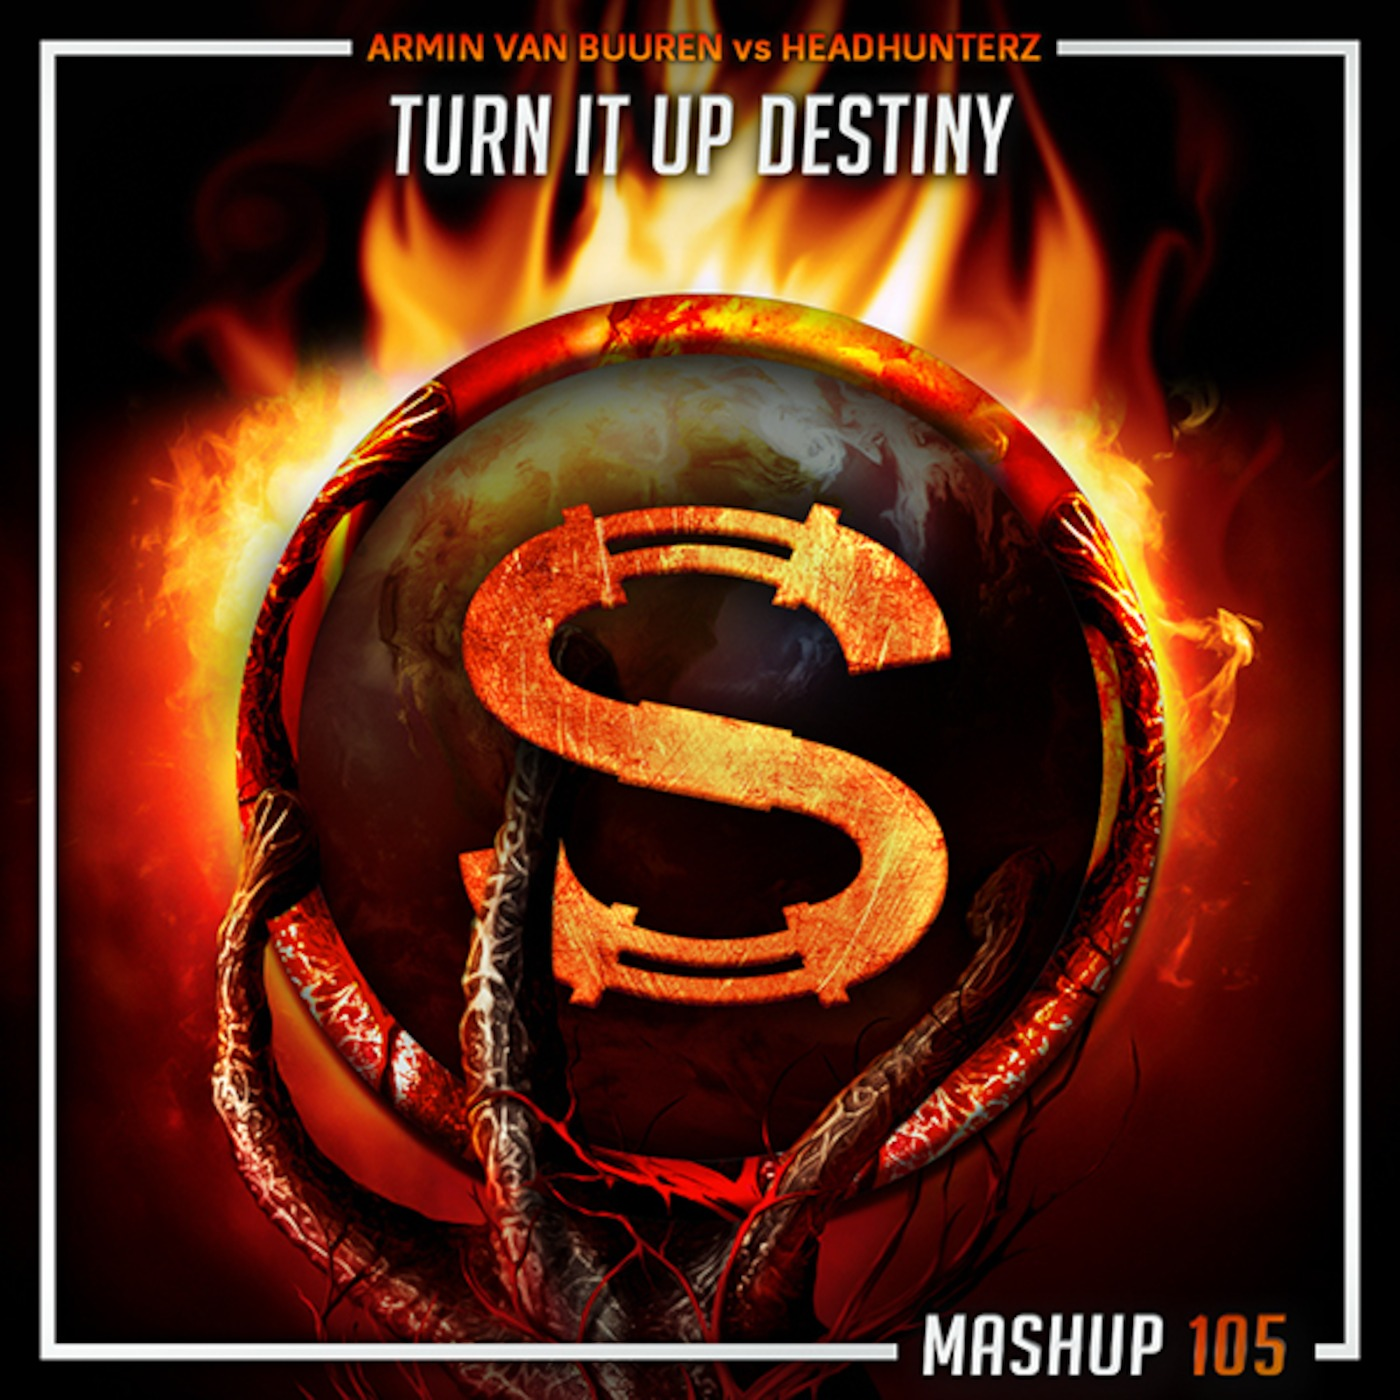 Armin Van Buuren vs Headhunterz - Turn It Up Destiny End (Da Sylva mashup)